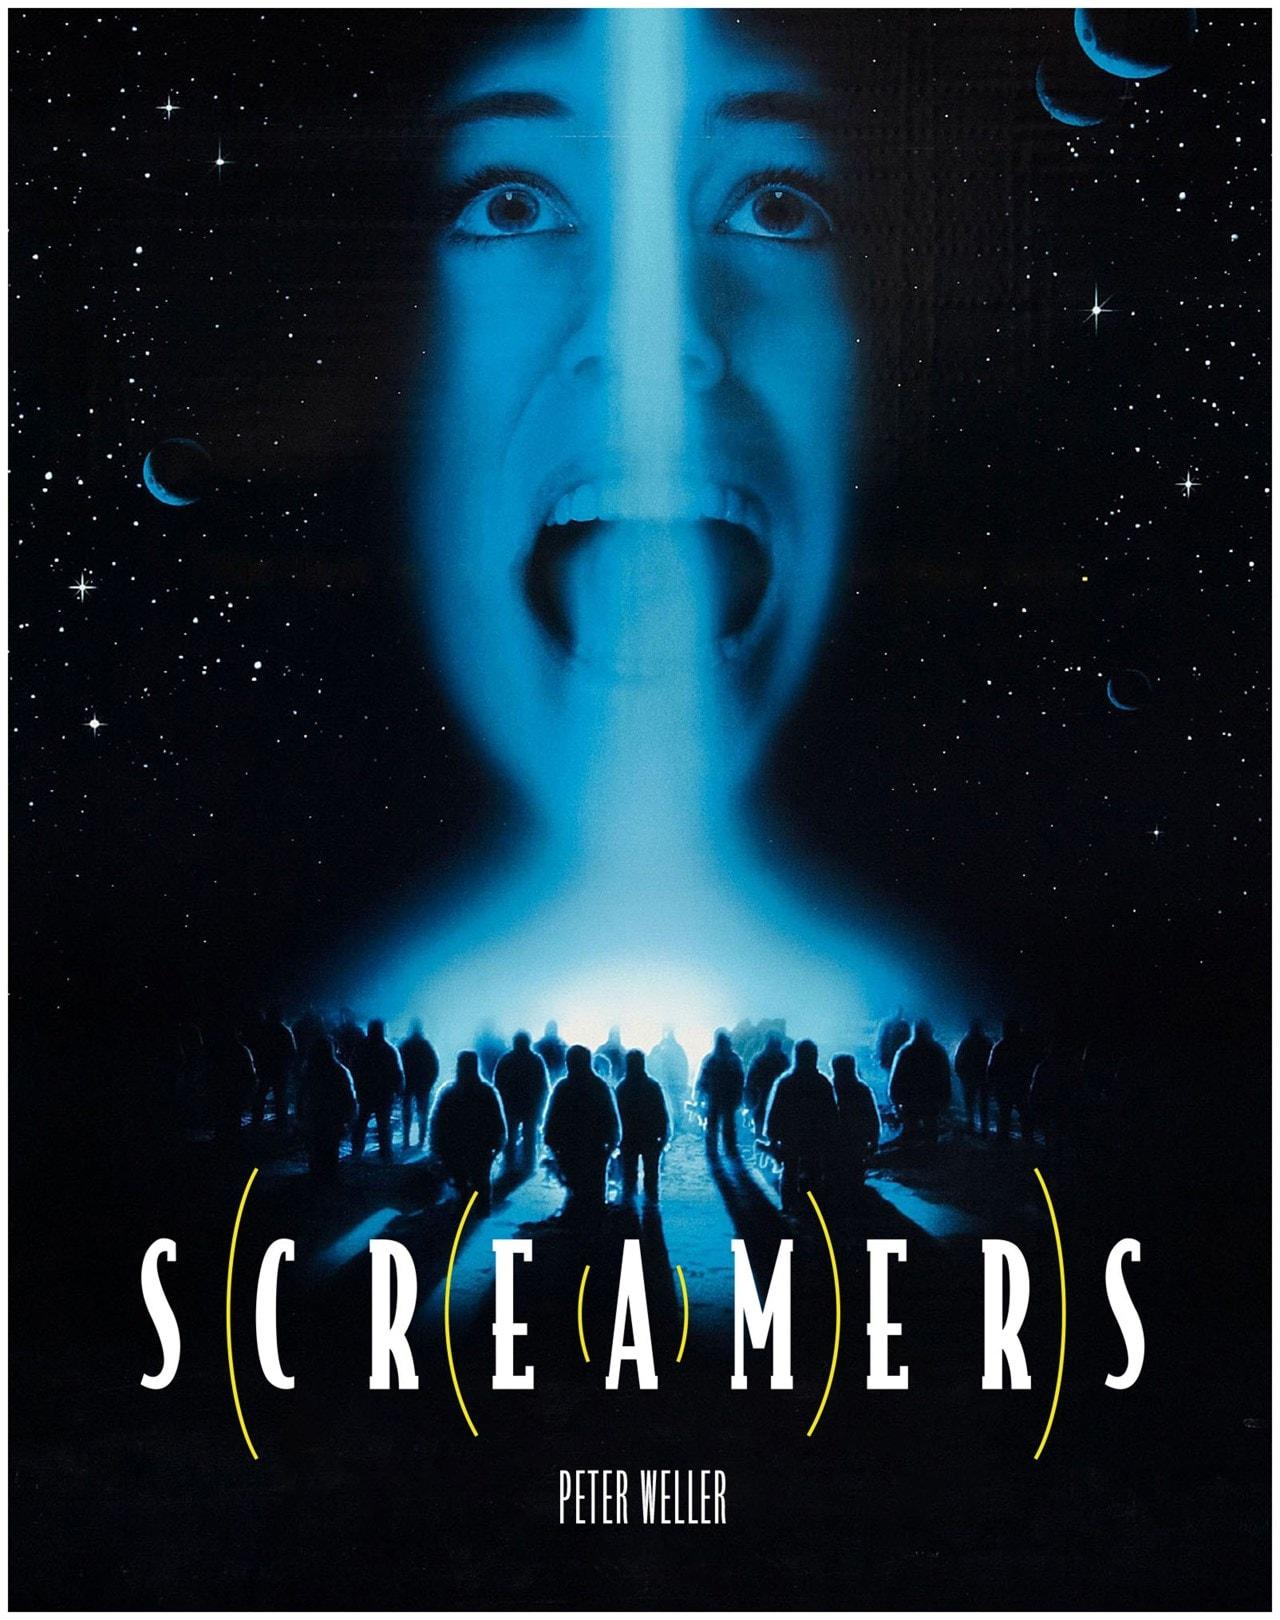 Screamers - 2